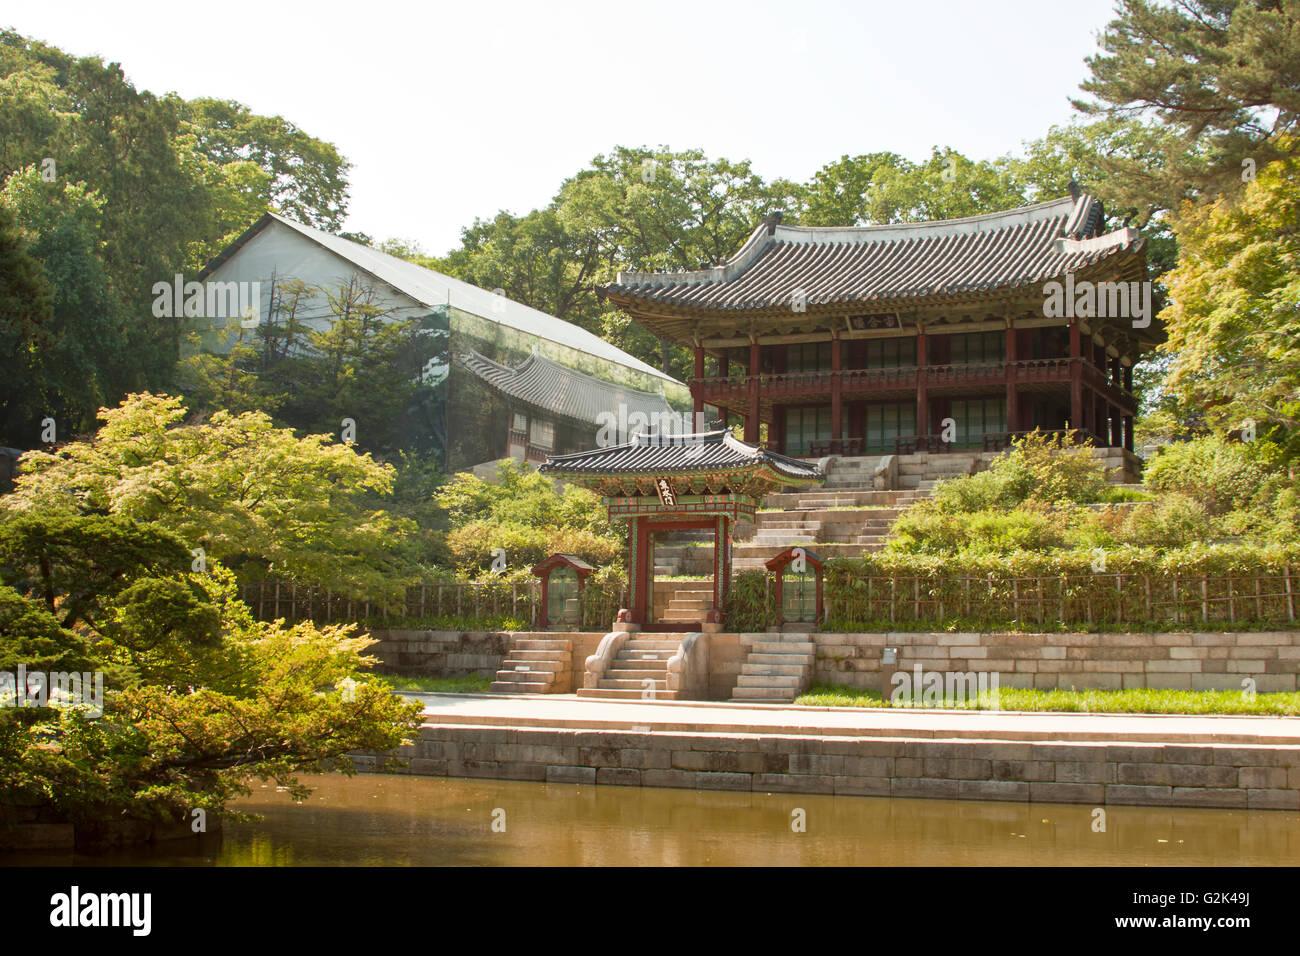 Seoul, South Korea- May 21, 2015: Secret Garden of Changdeokgung ...